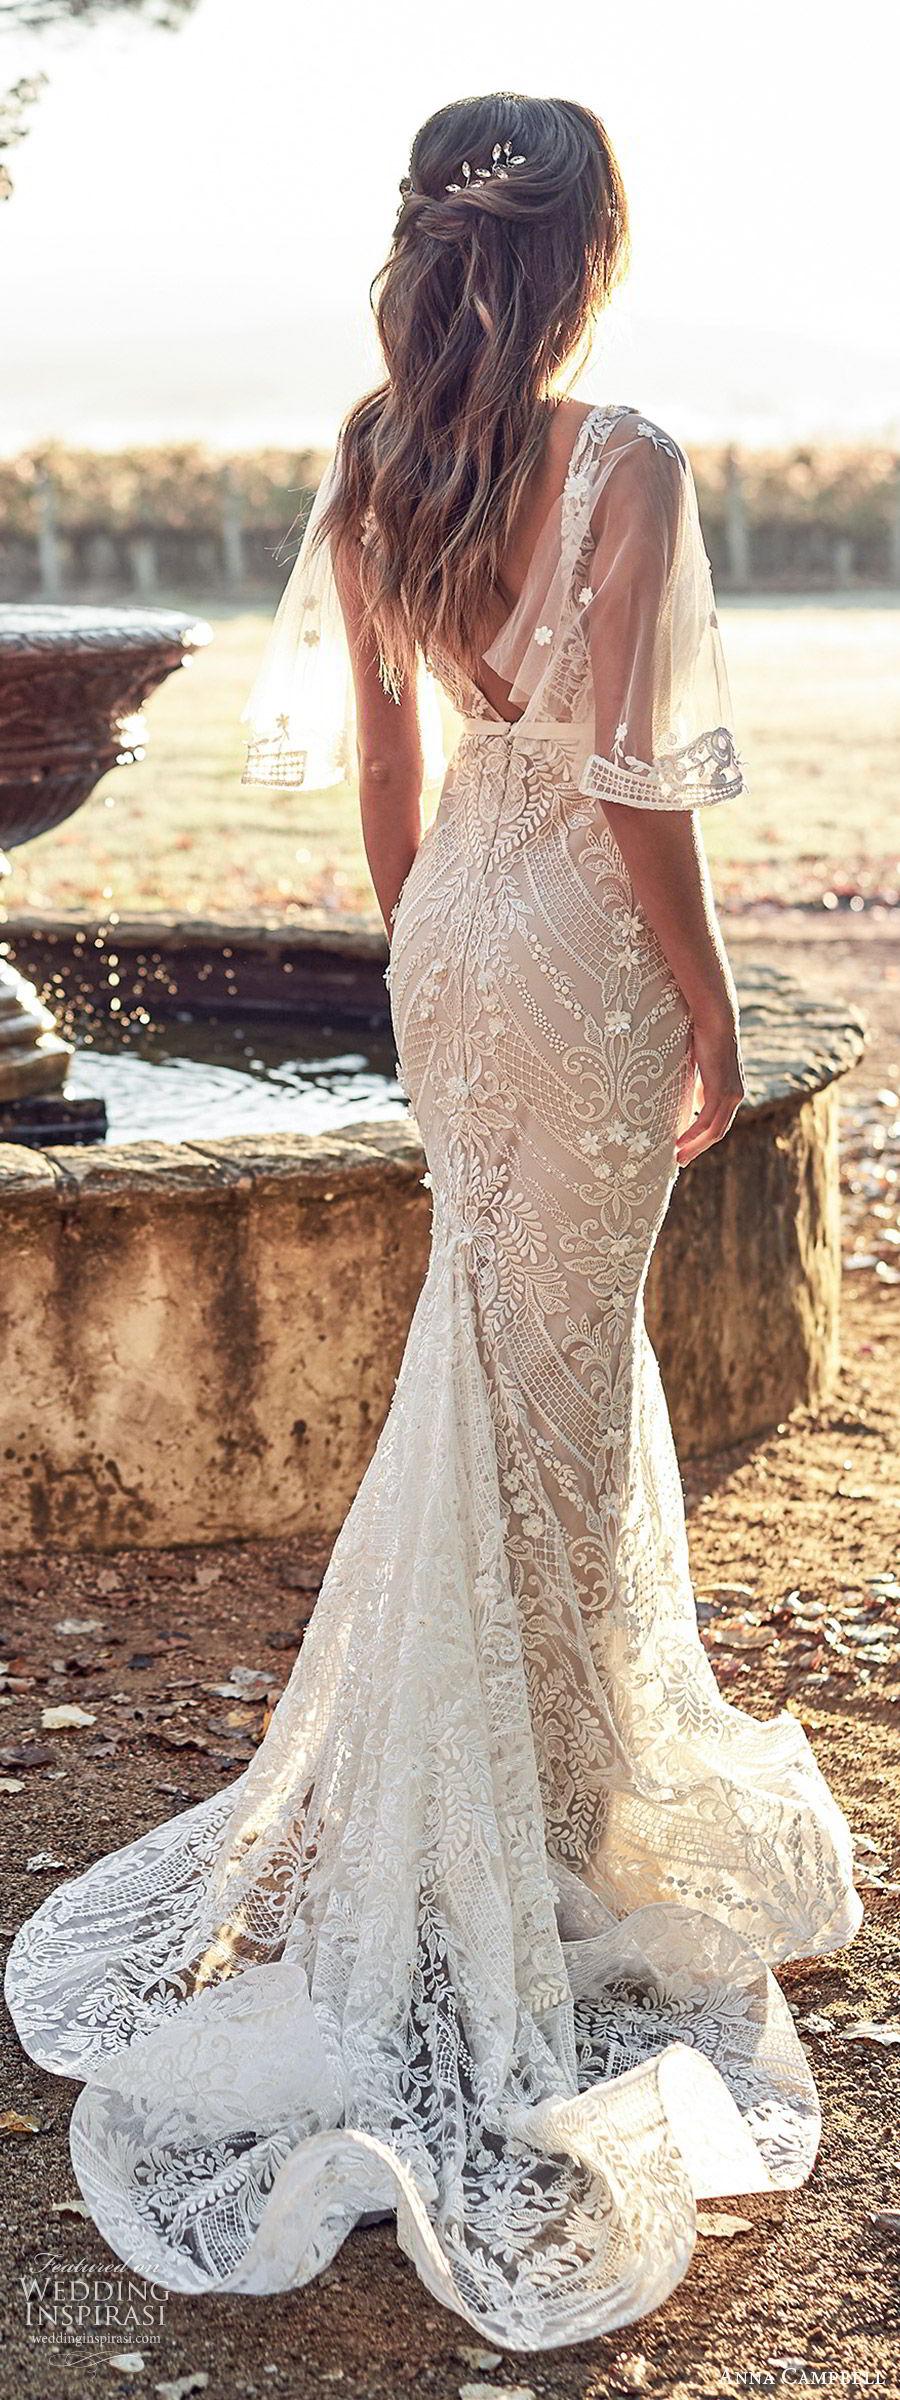 anna campbell 2020 bridal illusion flutter sleees sleeveless thick straps deep v neckline fully embellished embroidered lace sheath wedding dress (9) elegant v back chapel train bv